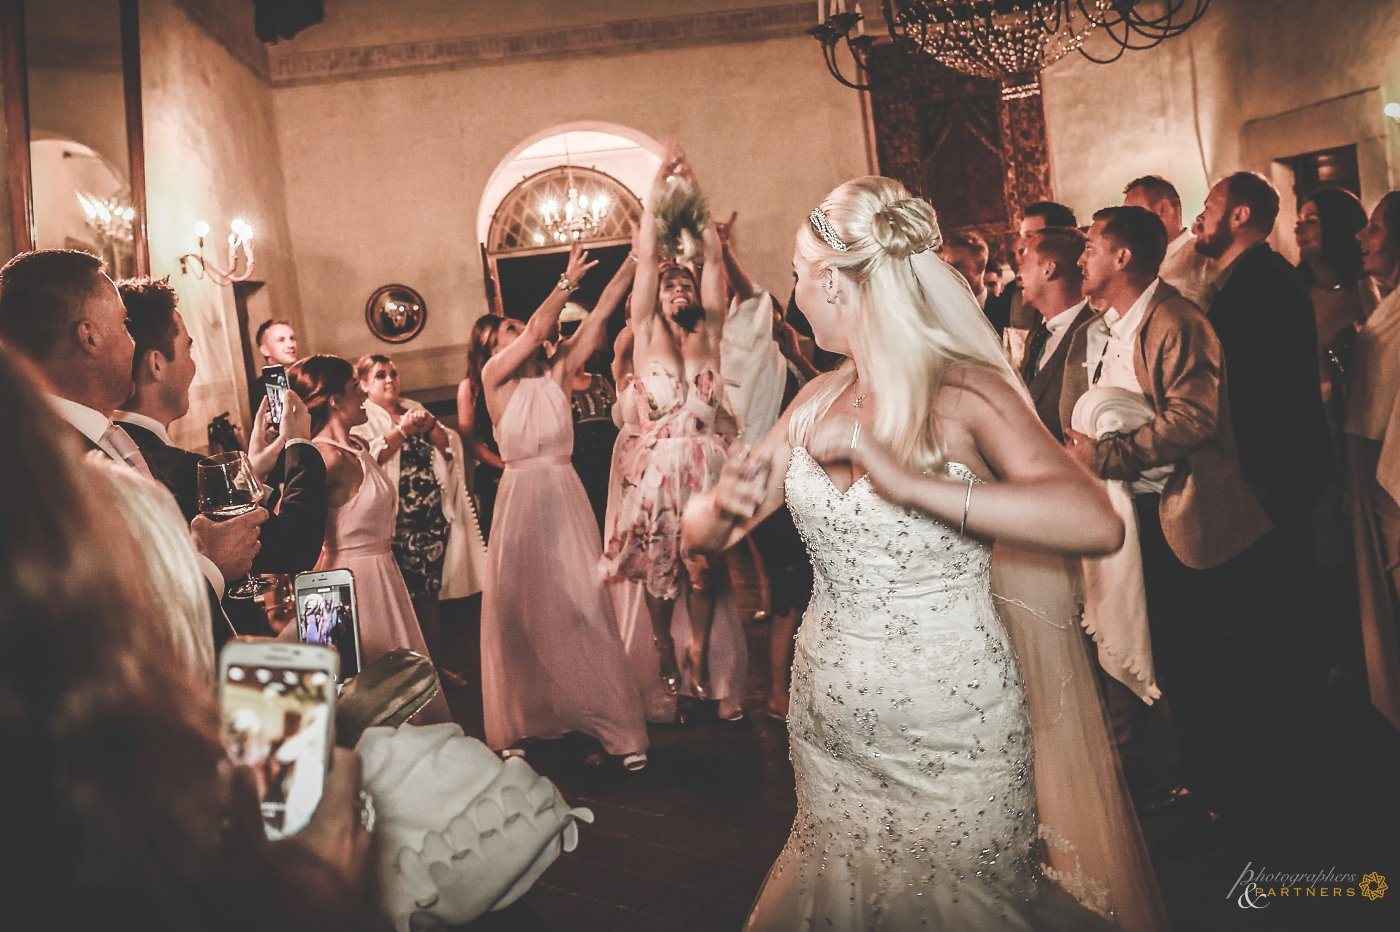 photography_weddings_catureglio_20.jpg